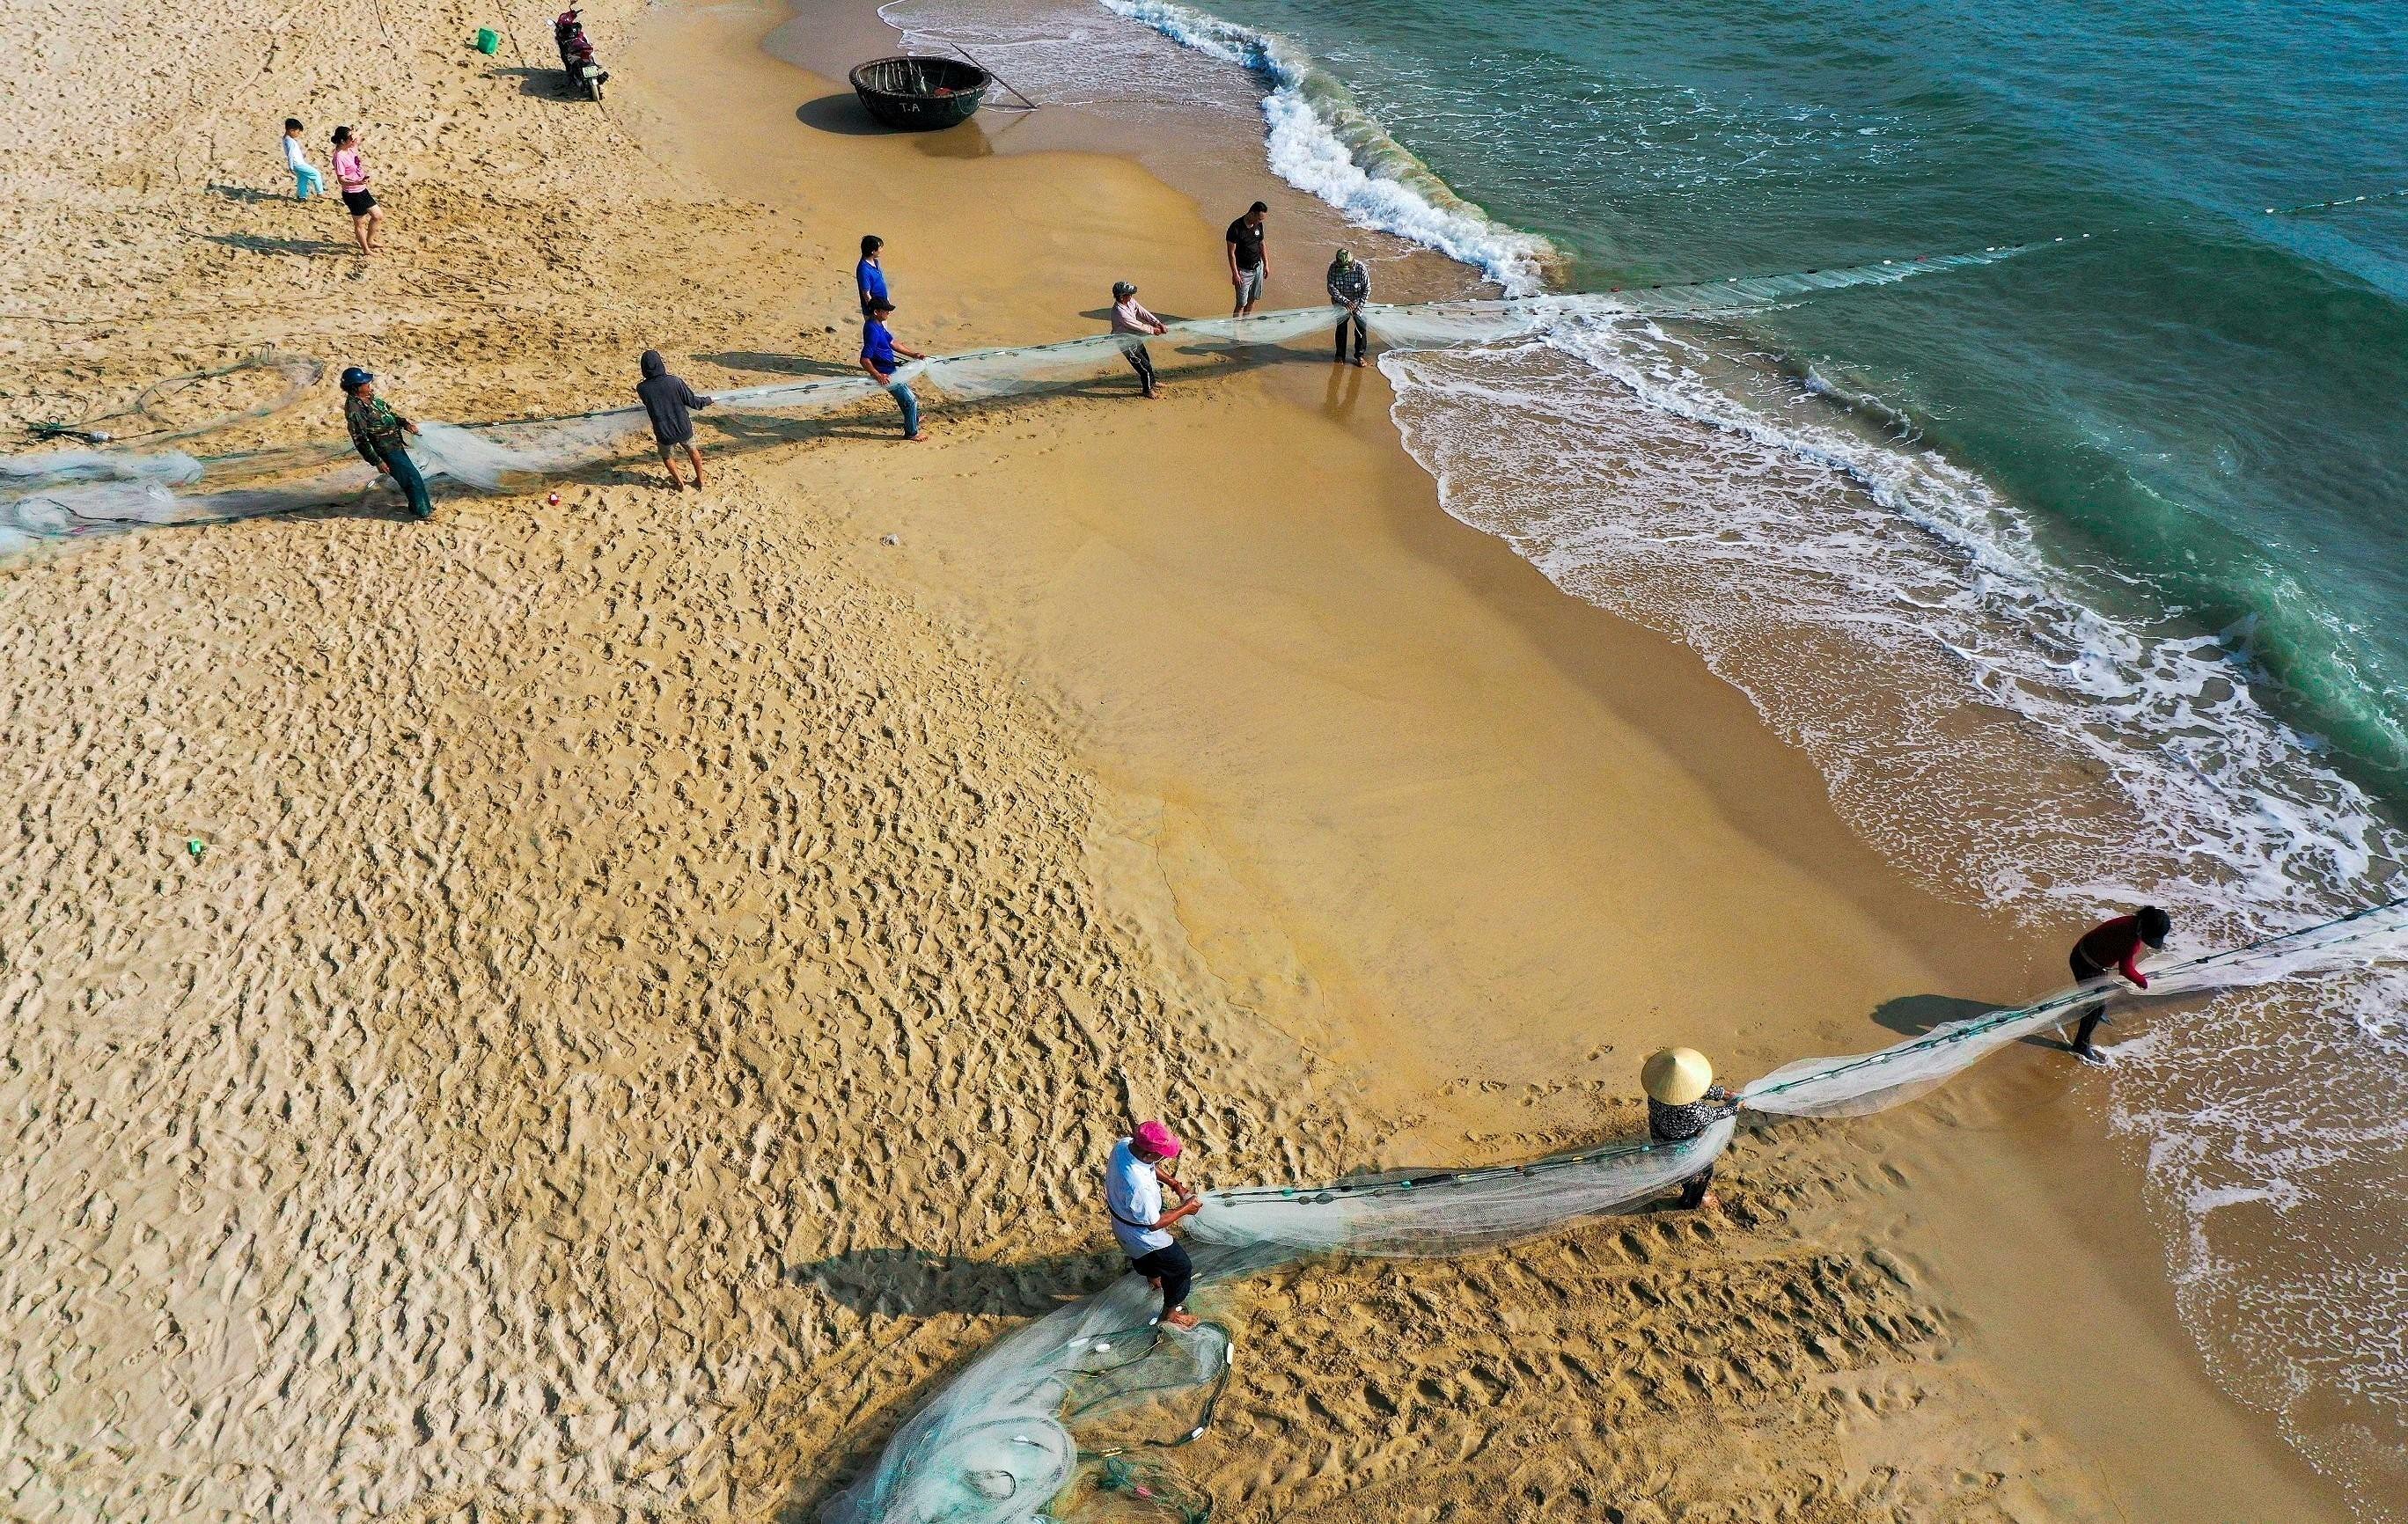 Fishermen pull in nets in Da Nang city hinh anh 1